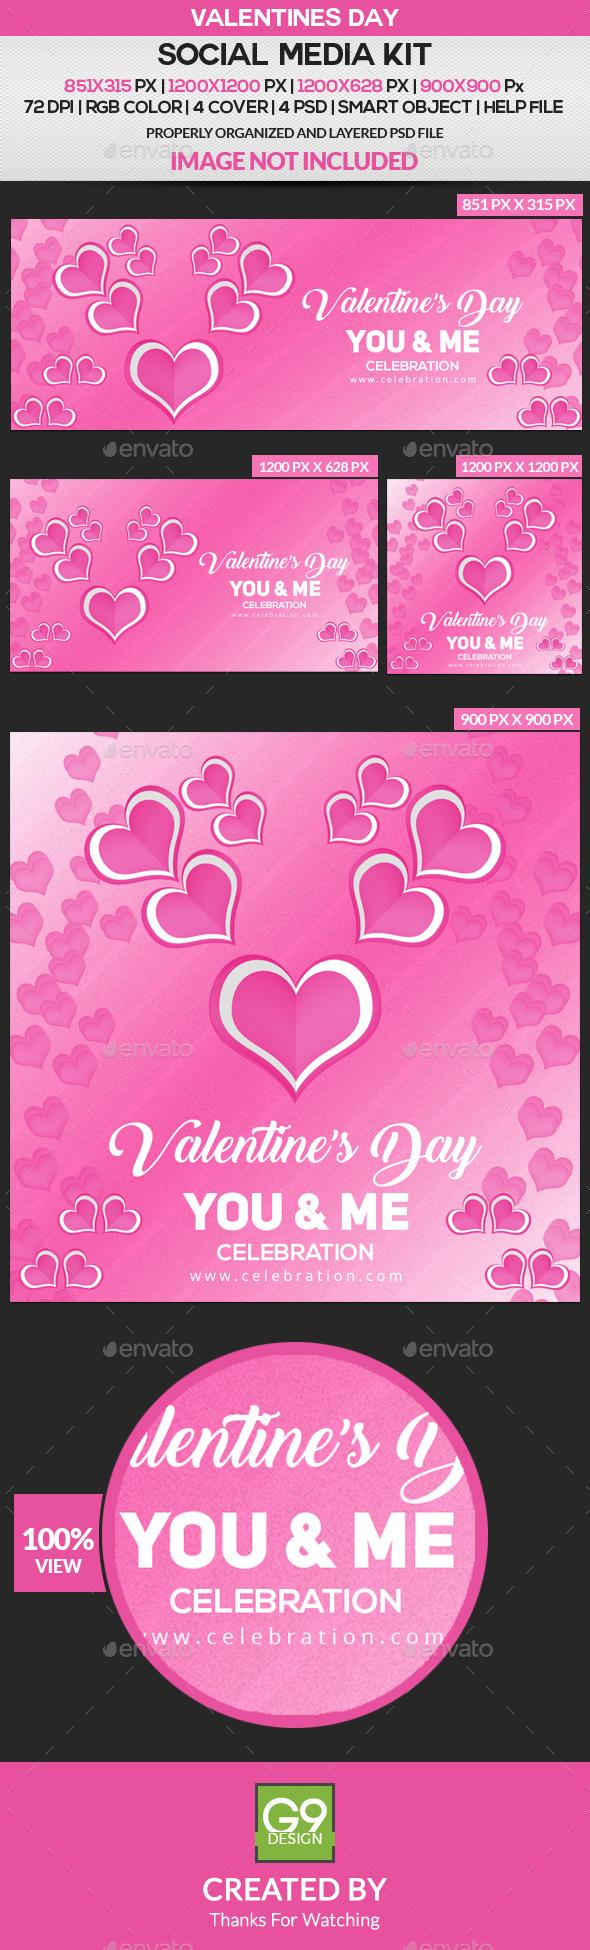 Valentines Day Social Media Kit - Miscellaneous Social Media